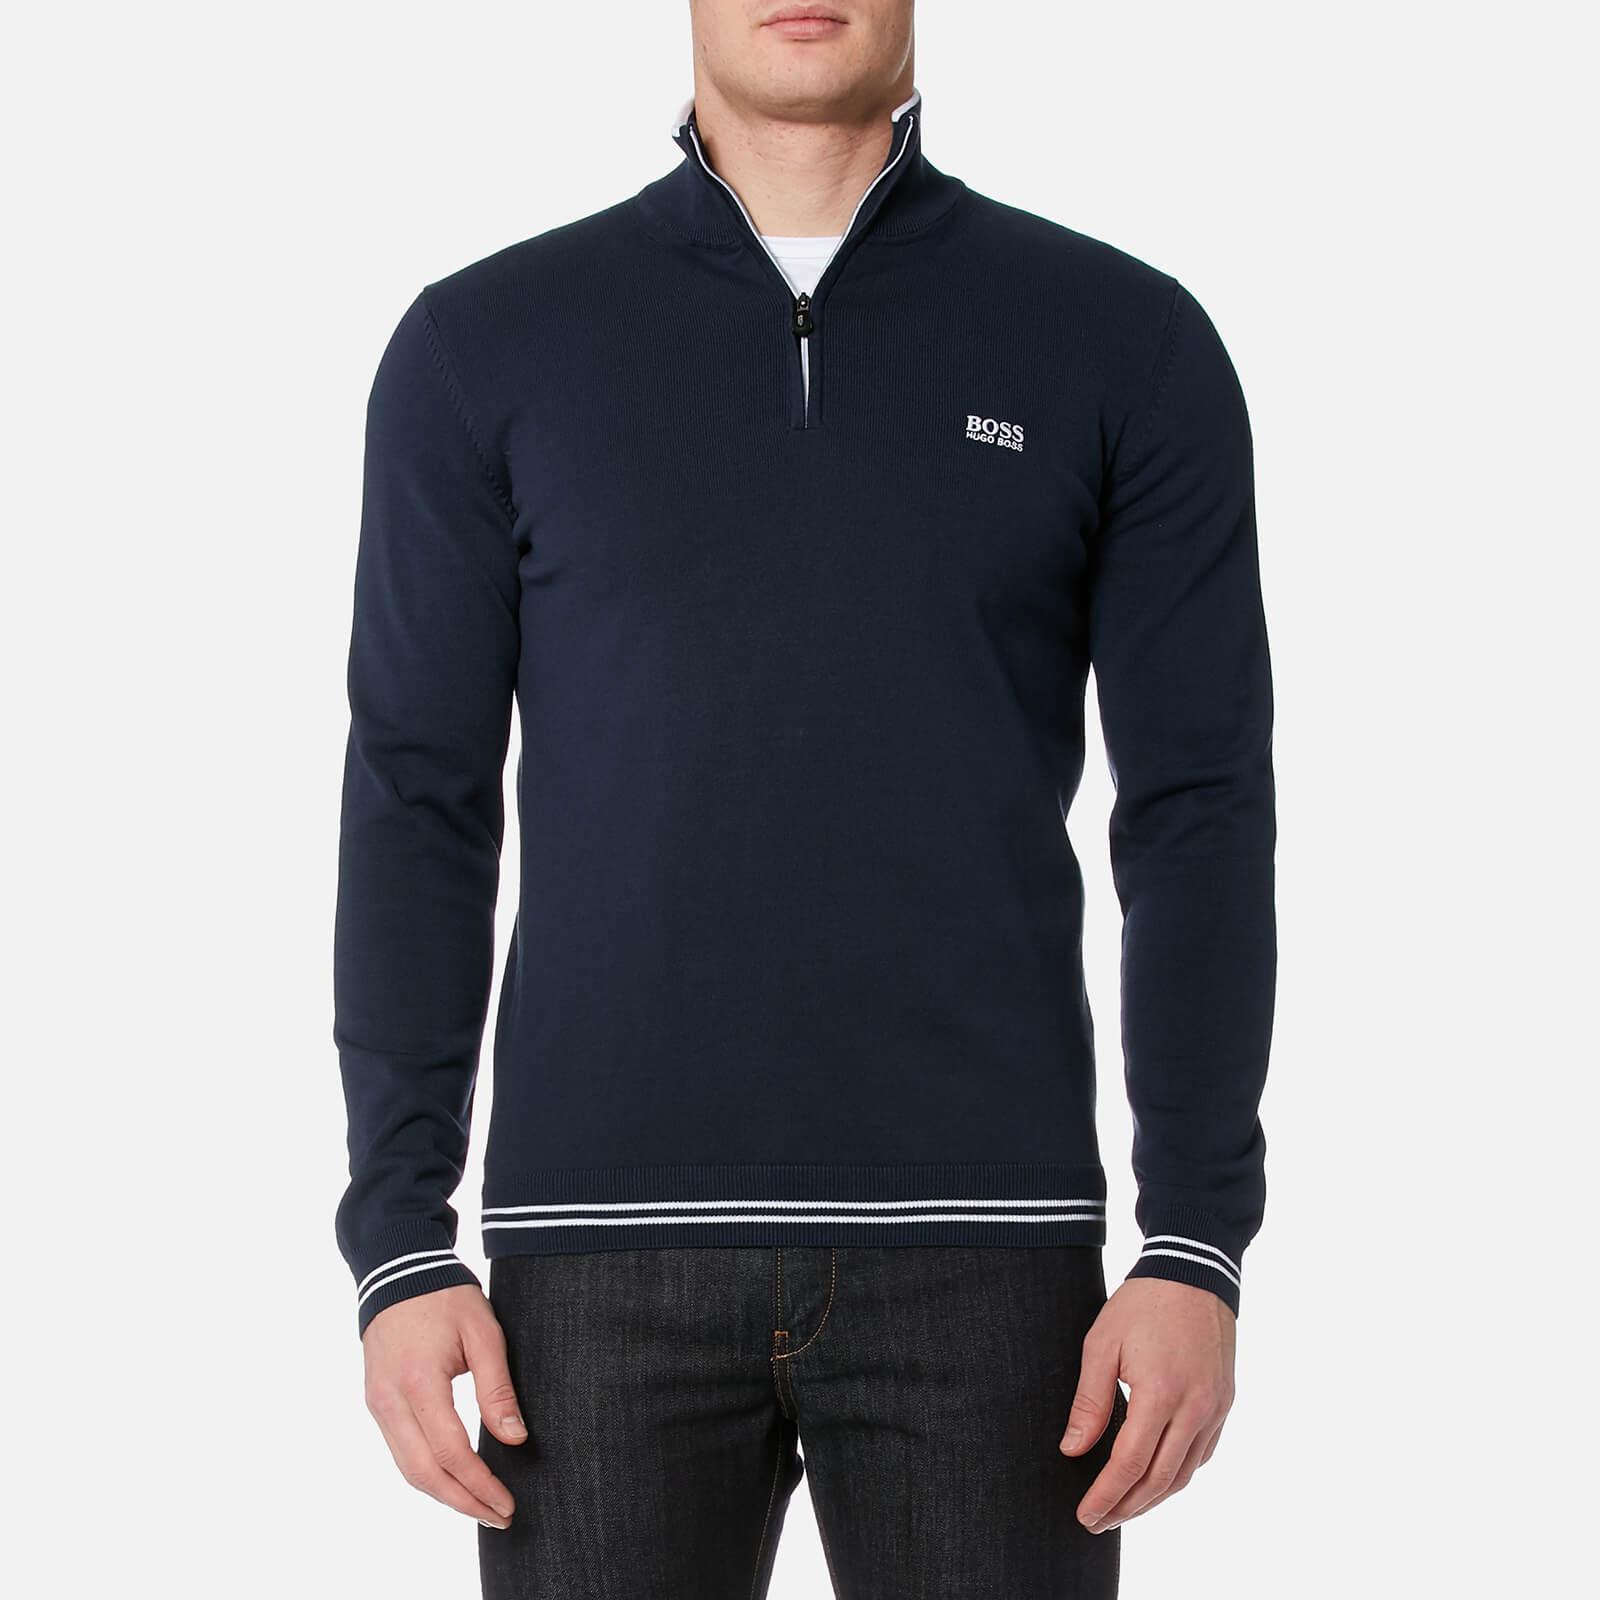 592e53b0f98 BOSS Green Men's Zime Quarter Zip Knitted Jumper - Navy